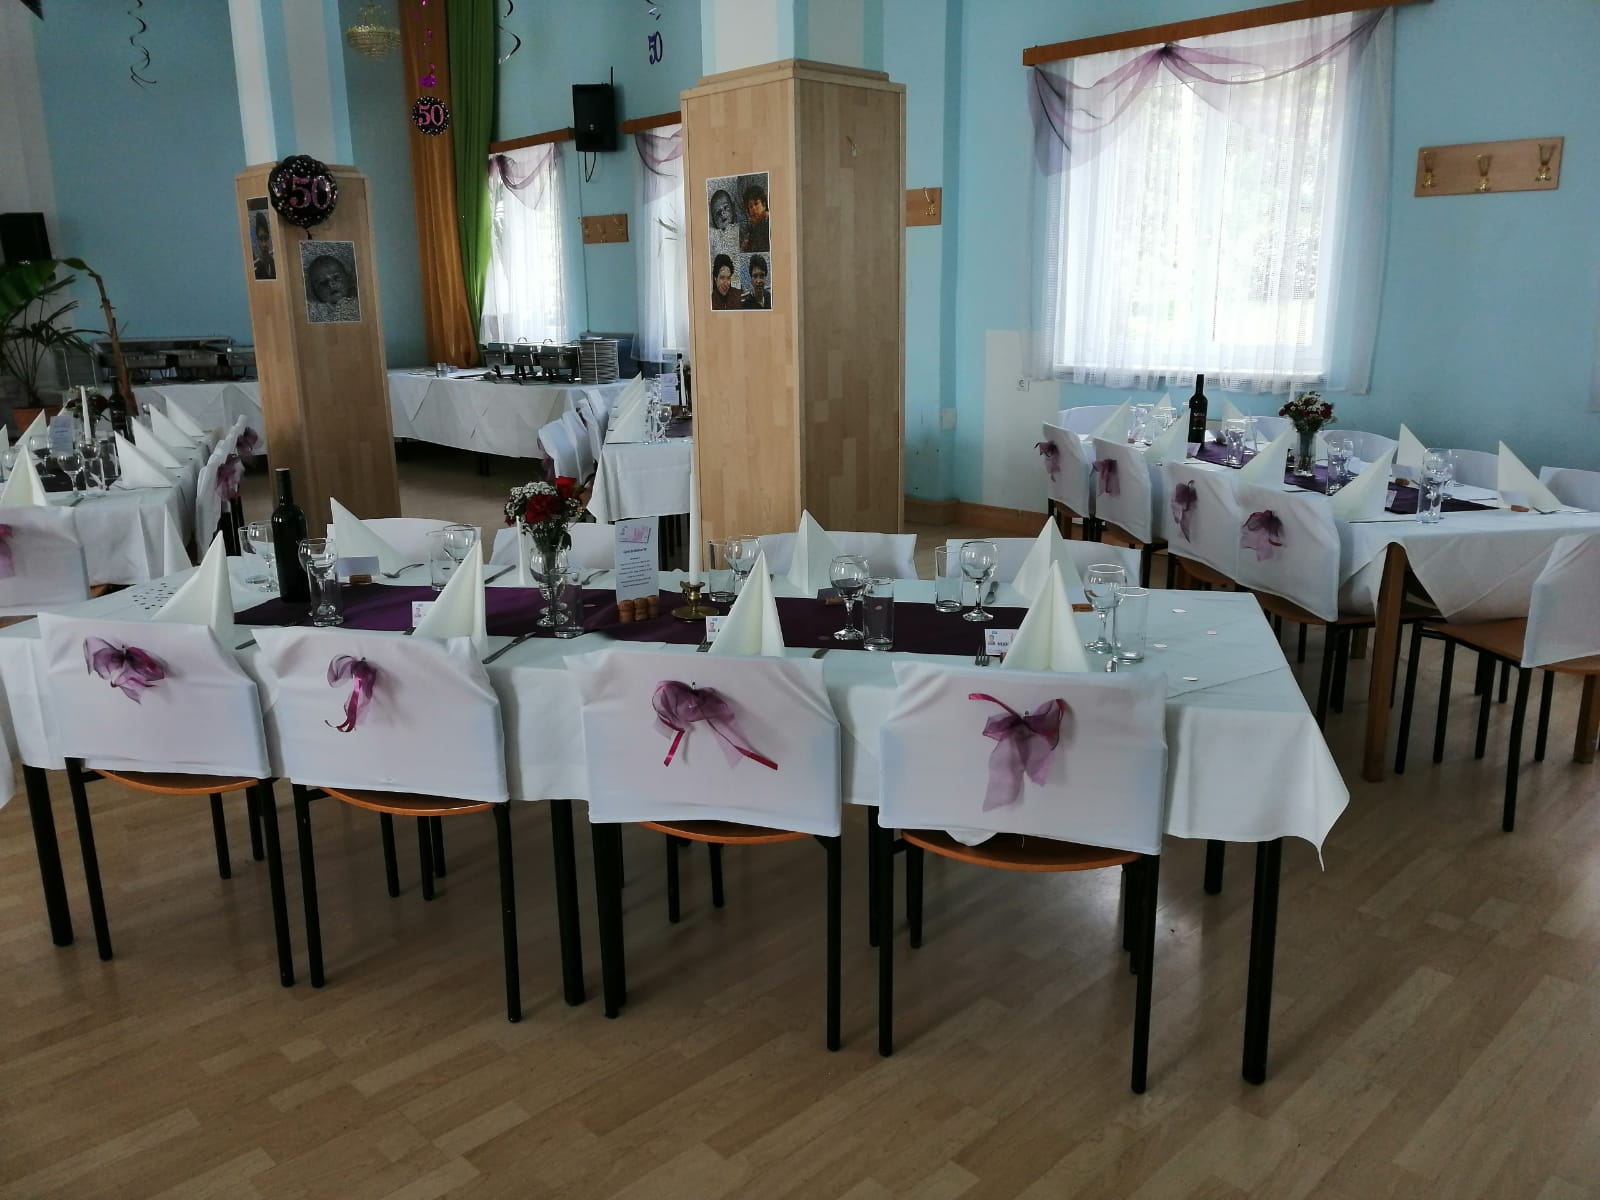 Tischreservierung Restaurant Heuberg Hernals Wien 1170